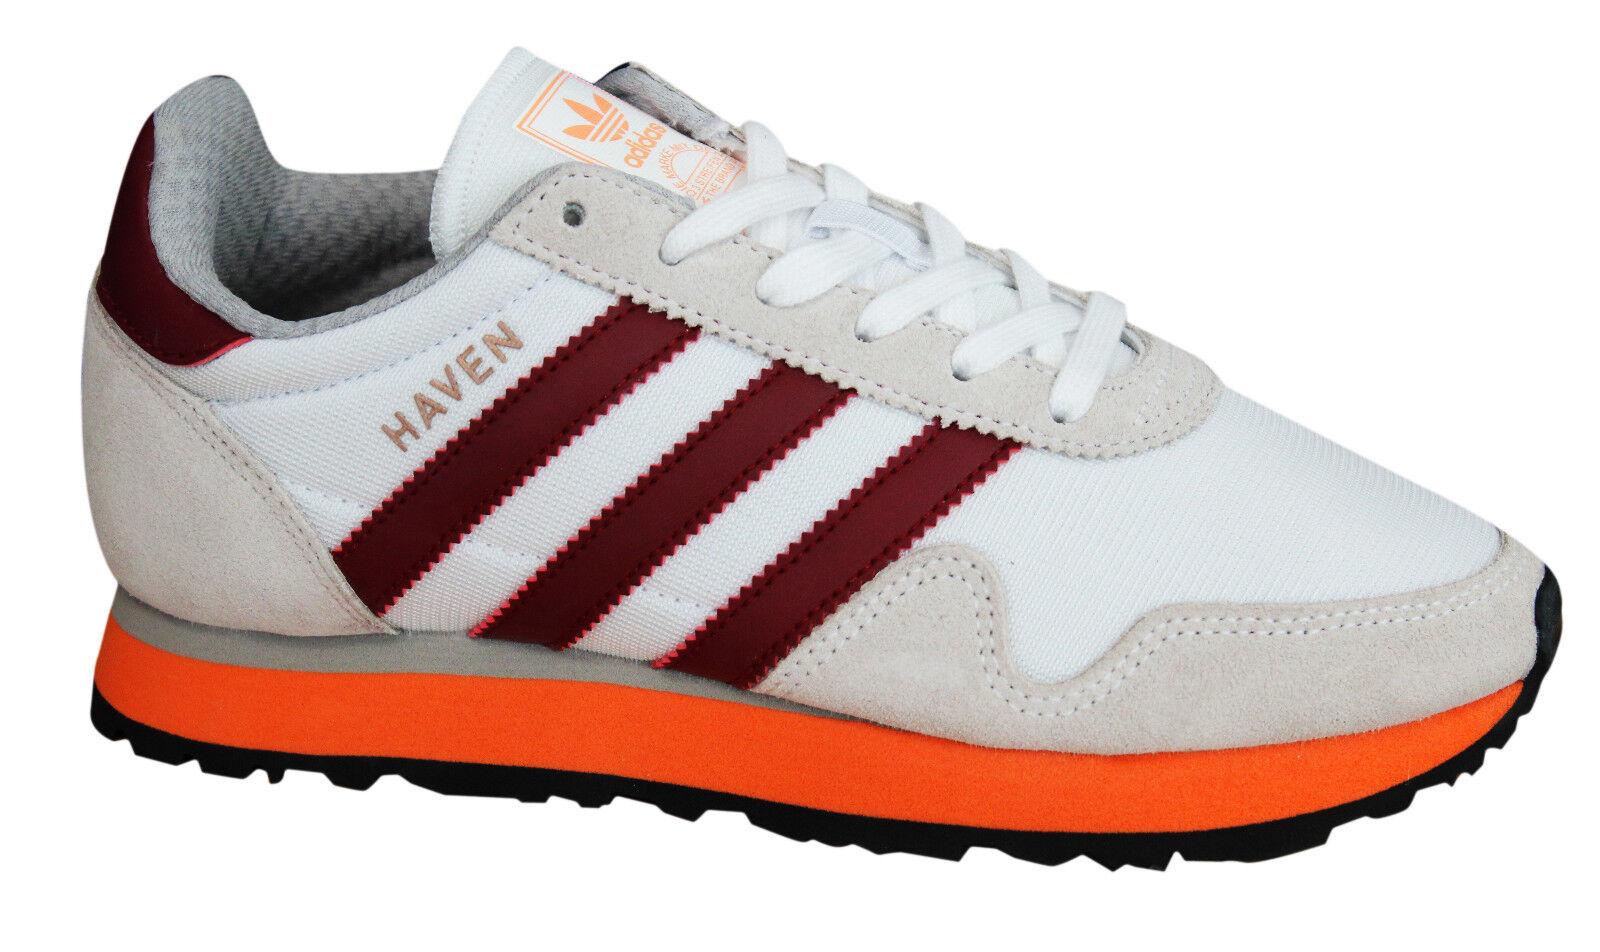 Adidas Originals Himmel Herren Turnschuhe Schnürschuhe Textil Netz Veloursleder